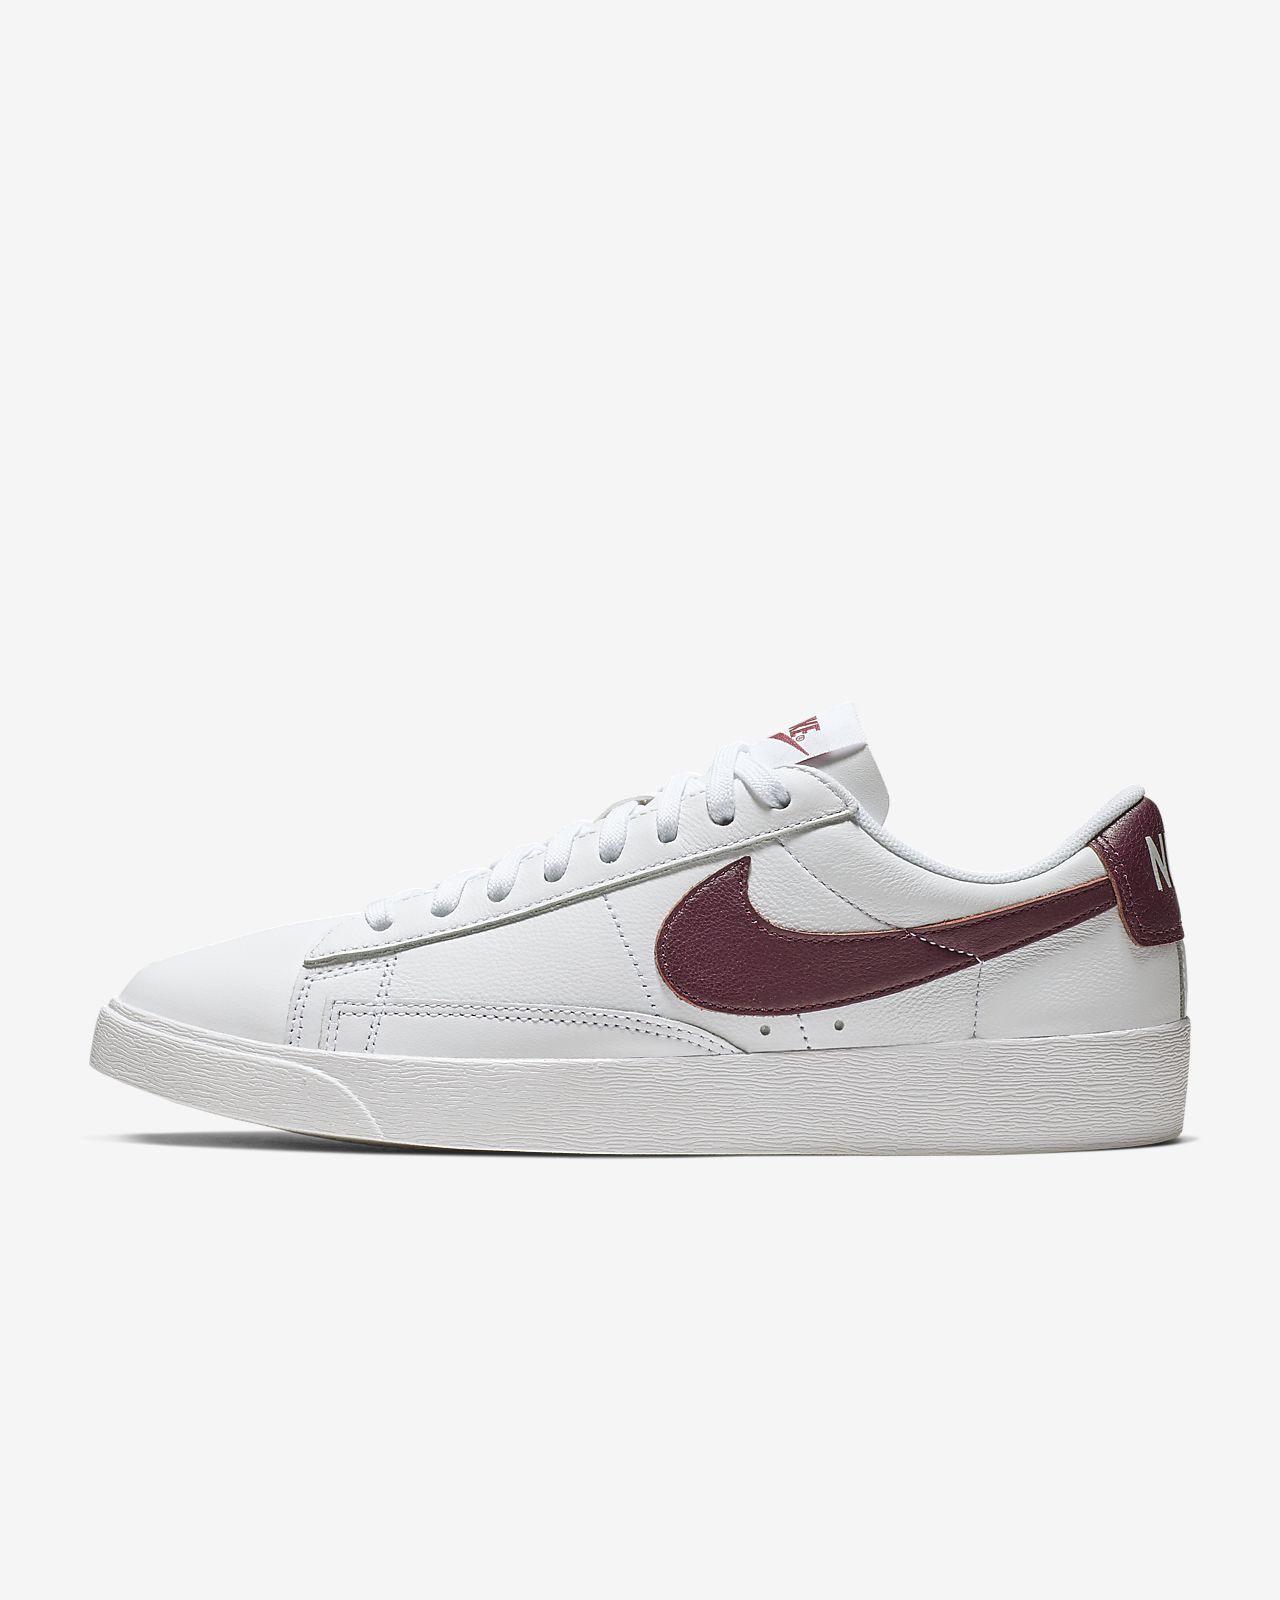 cheap for discount e835f 70b77 Chaussure Nike Blazer Low LE pour Femme